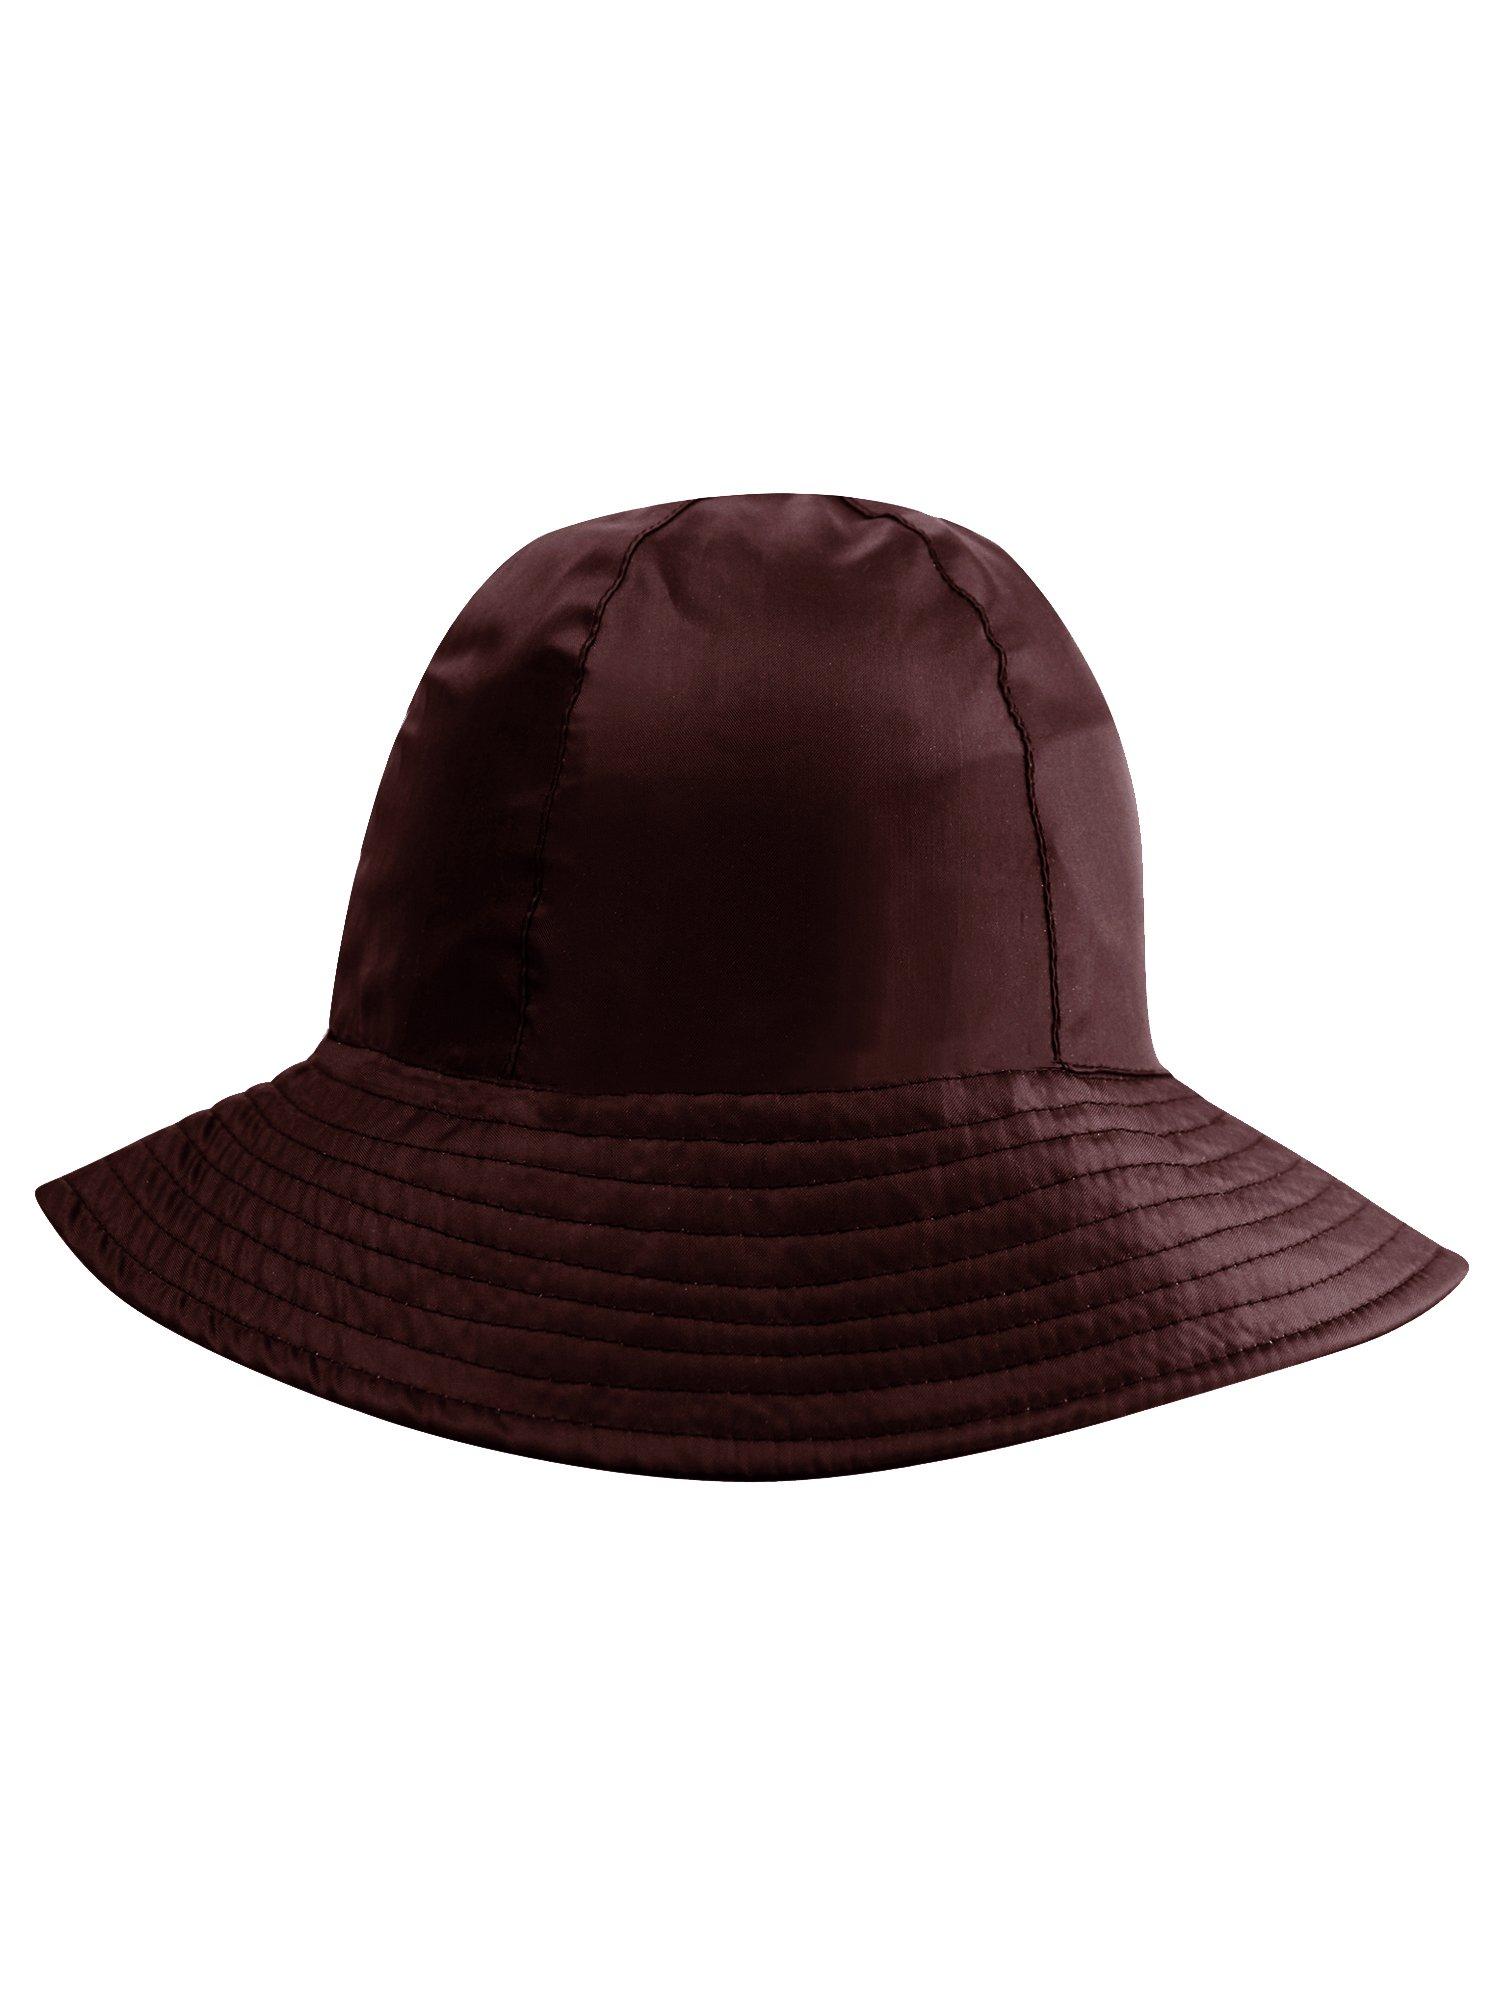 Brown Reversible Rain Or Sun Style Bucket Hat